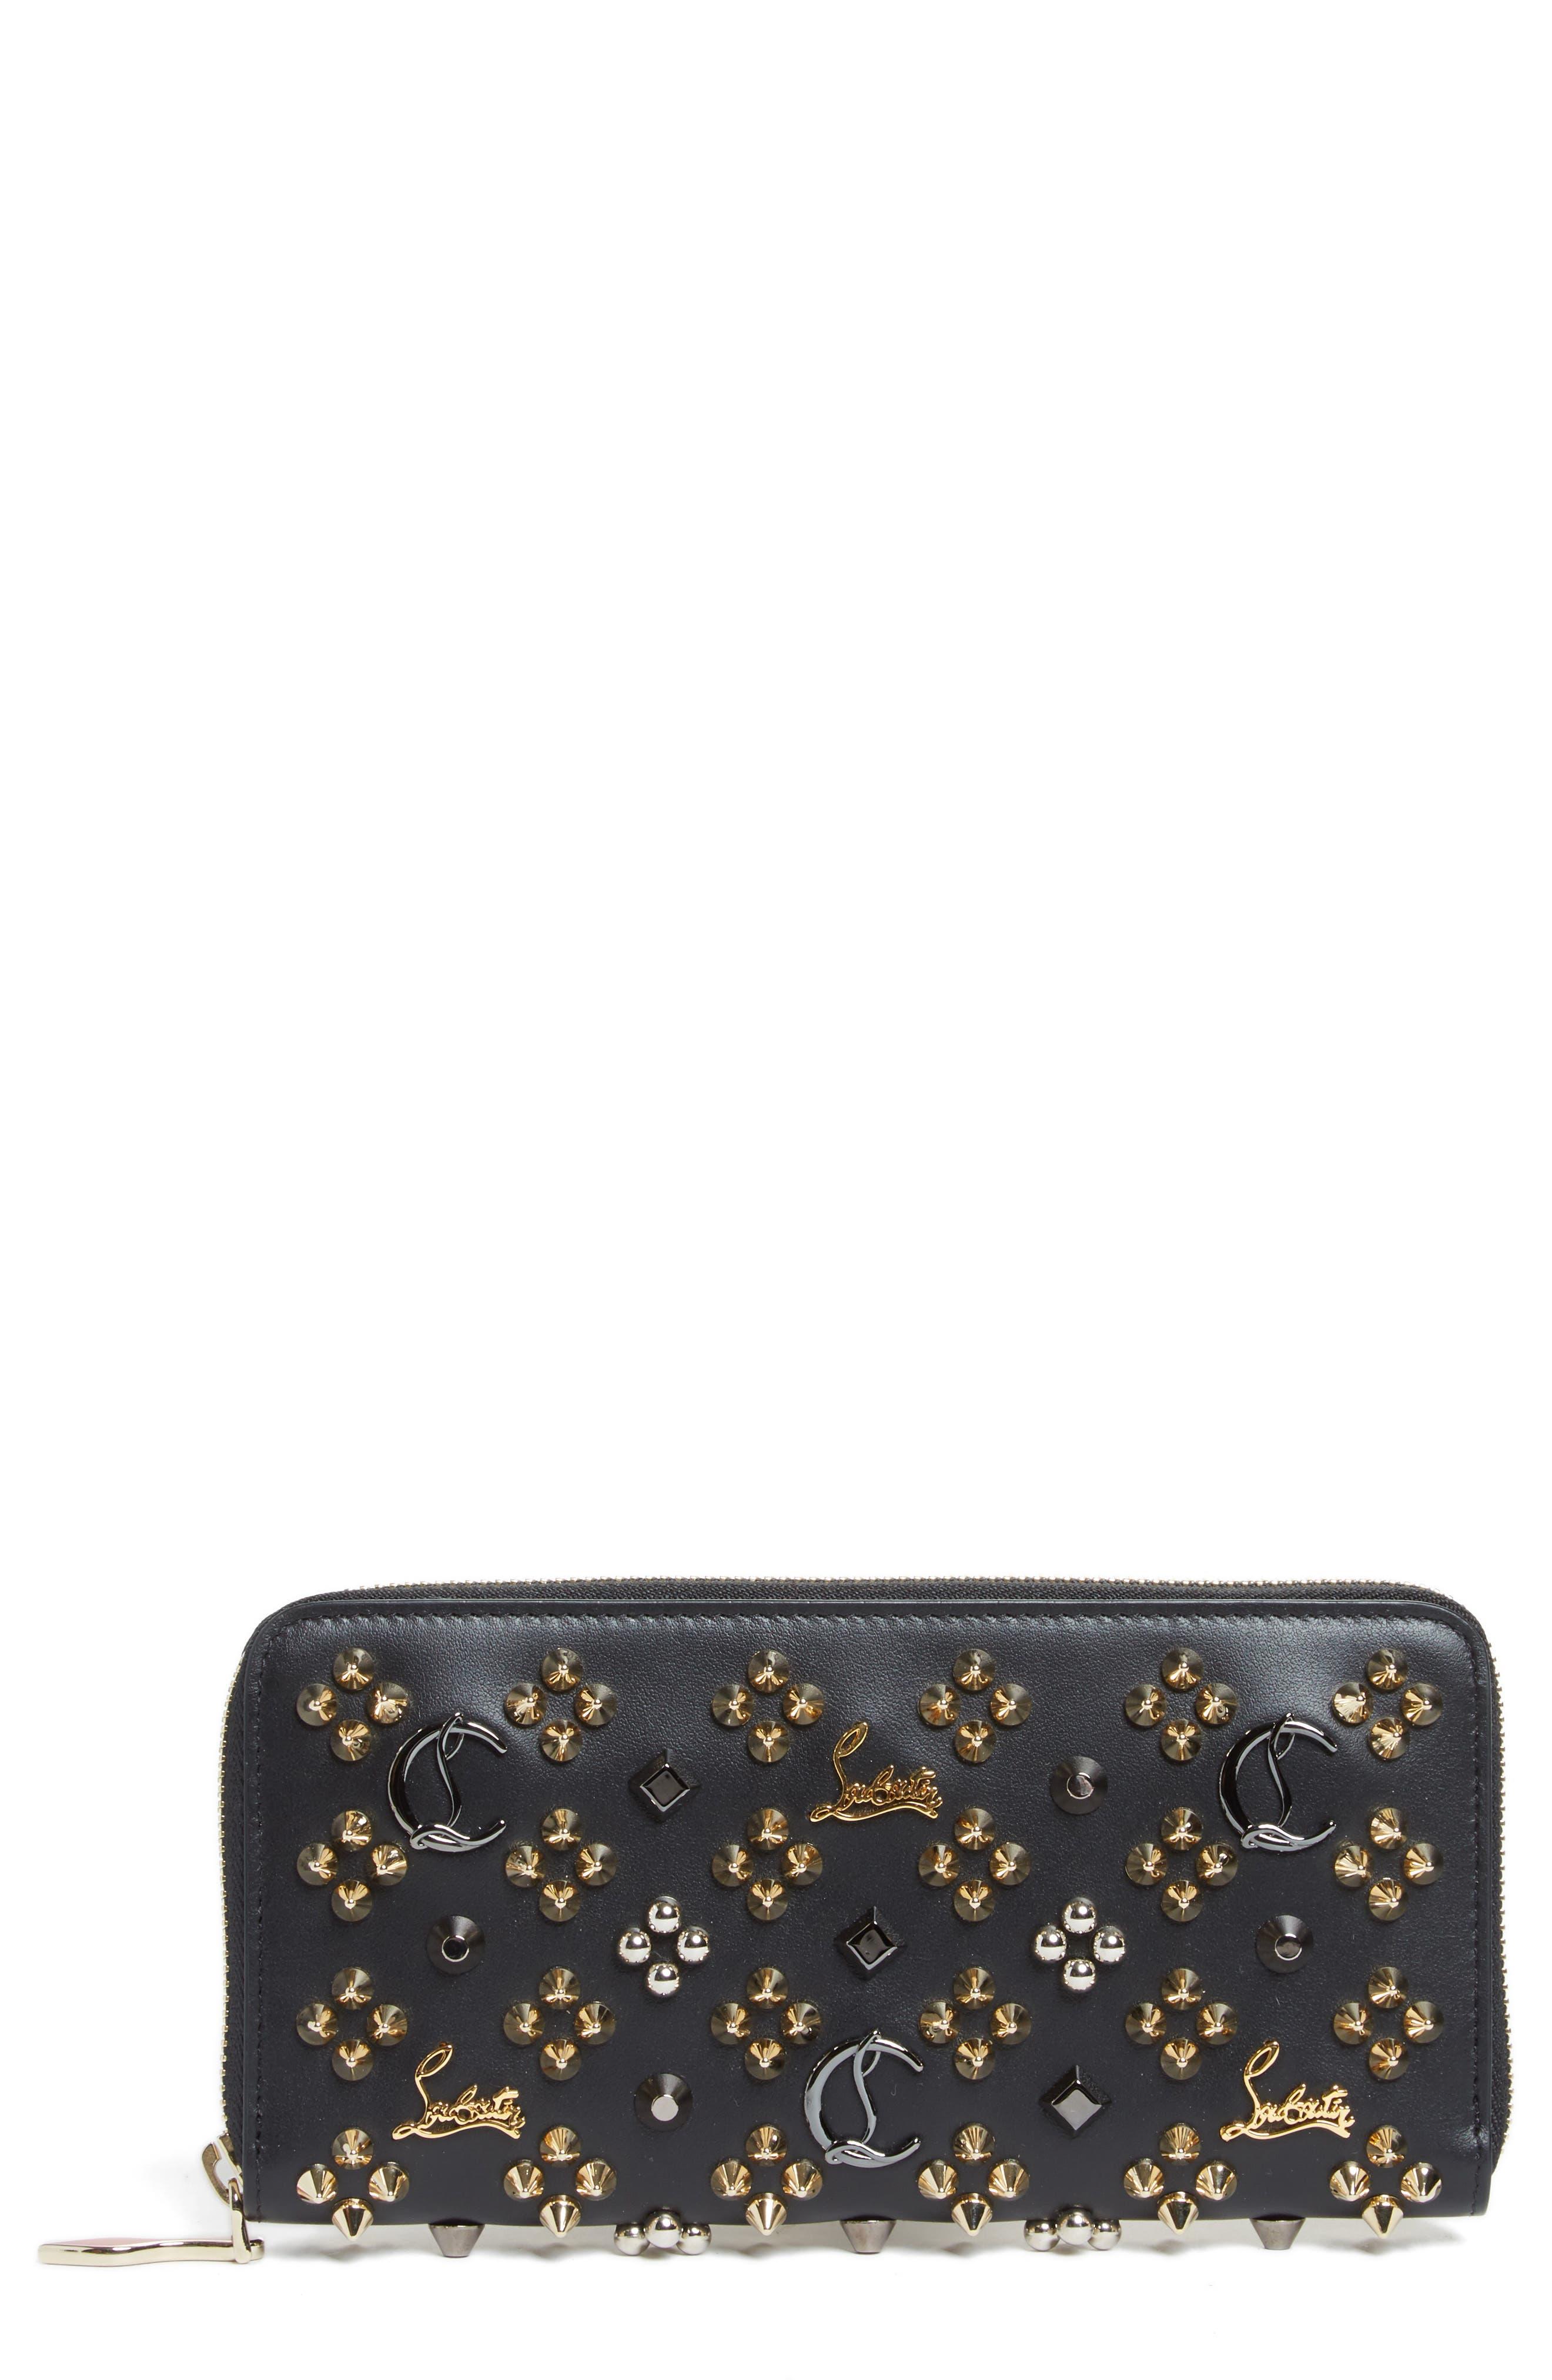 Panettone Spiked Calfskin Wallet,                         Main,                         color, BLACK/MULTIMETAL